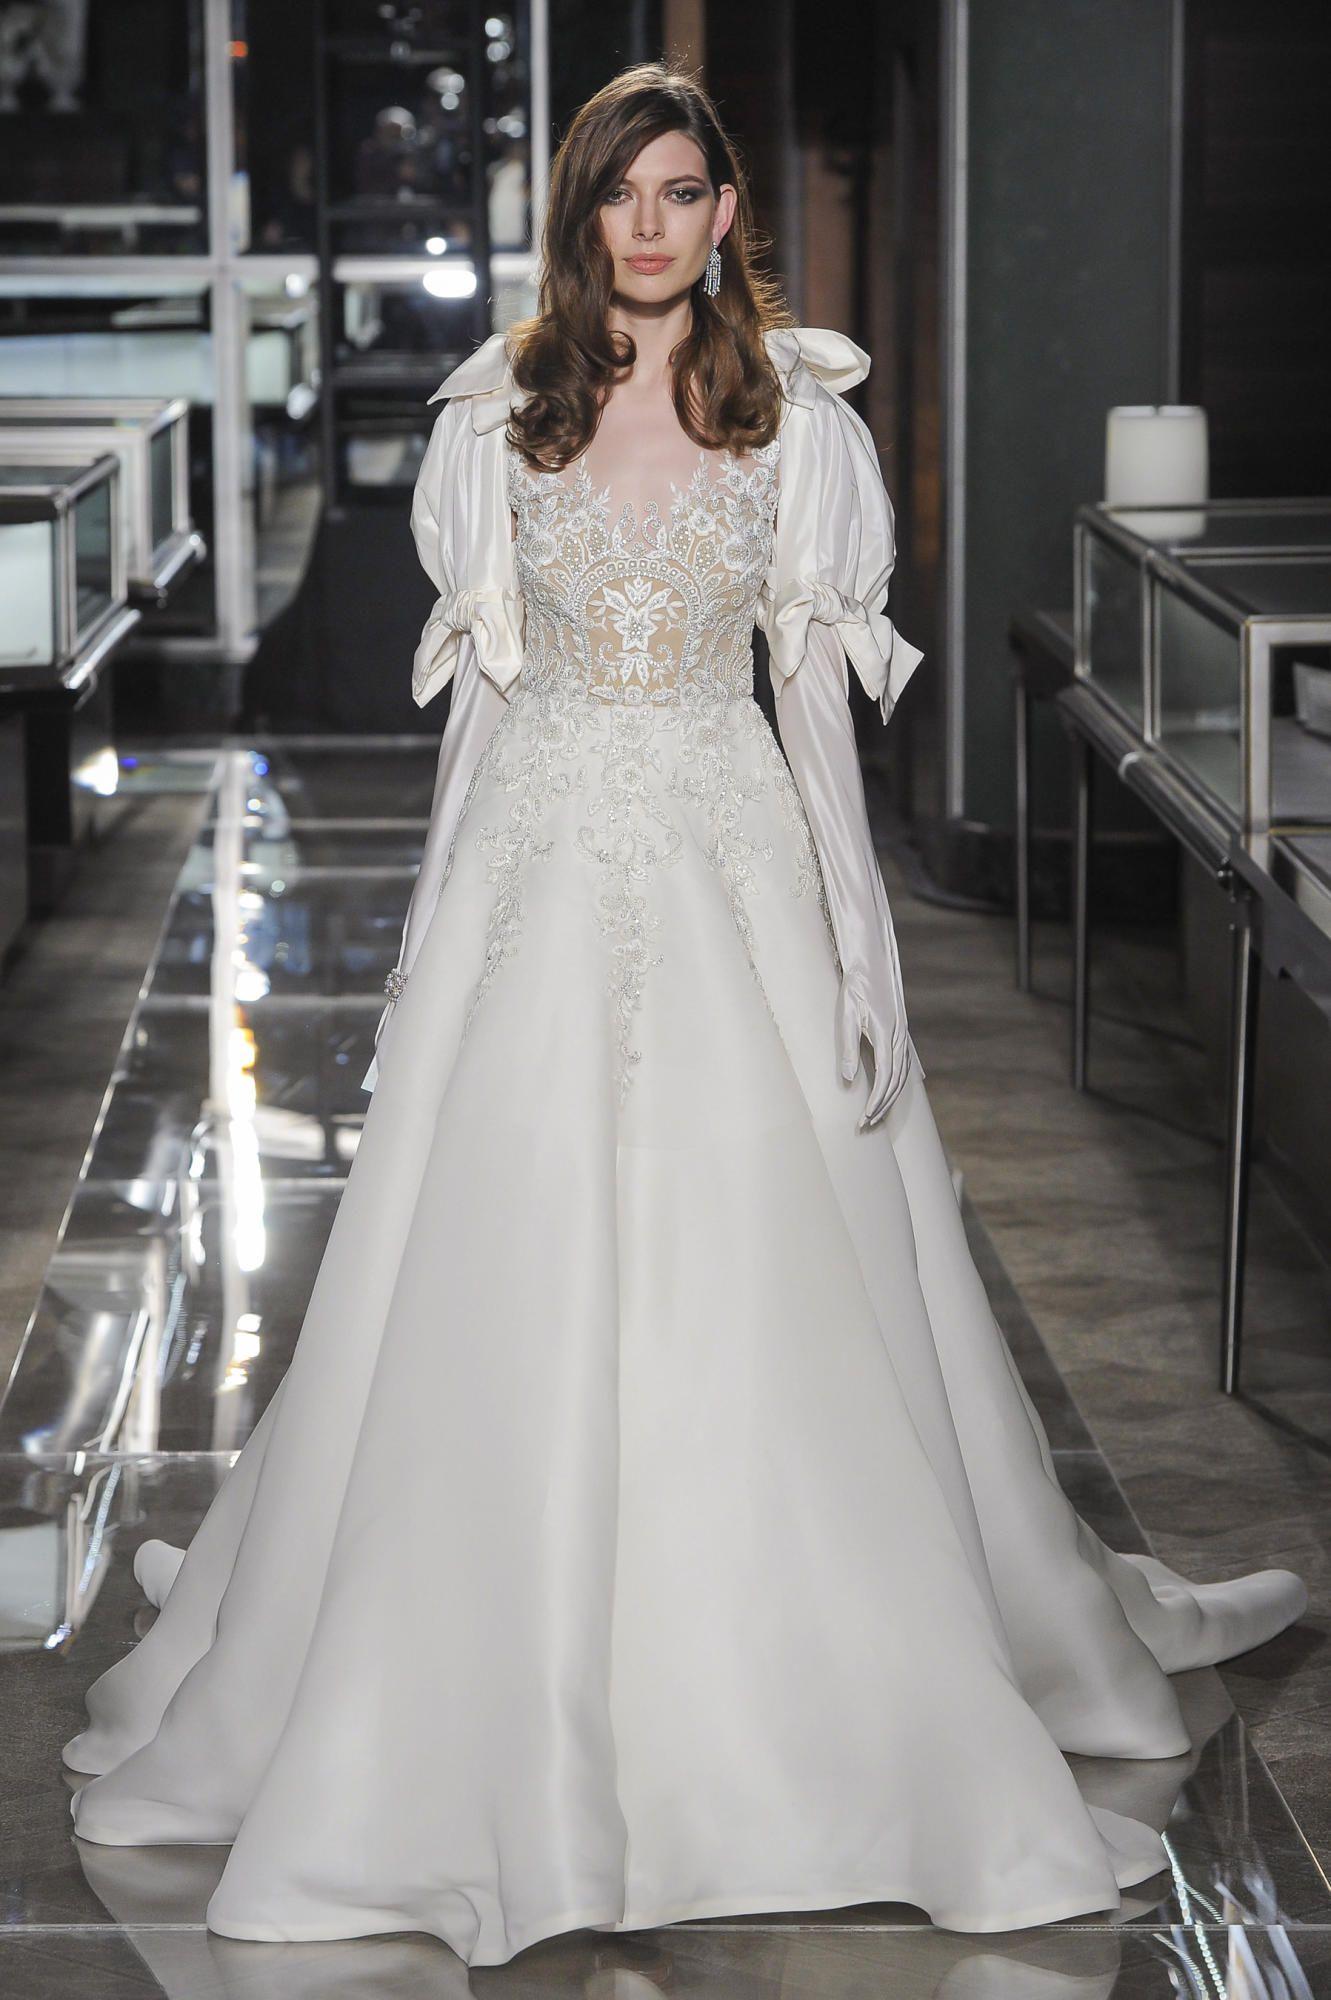 reem-acra-bridal-spring-2018-puff-sleeve Tendências de vestidos de noiva para 2018